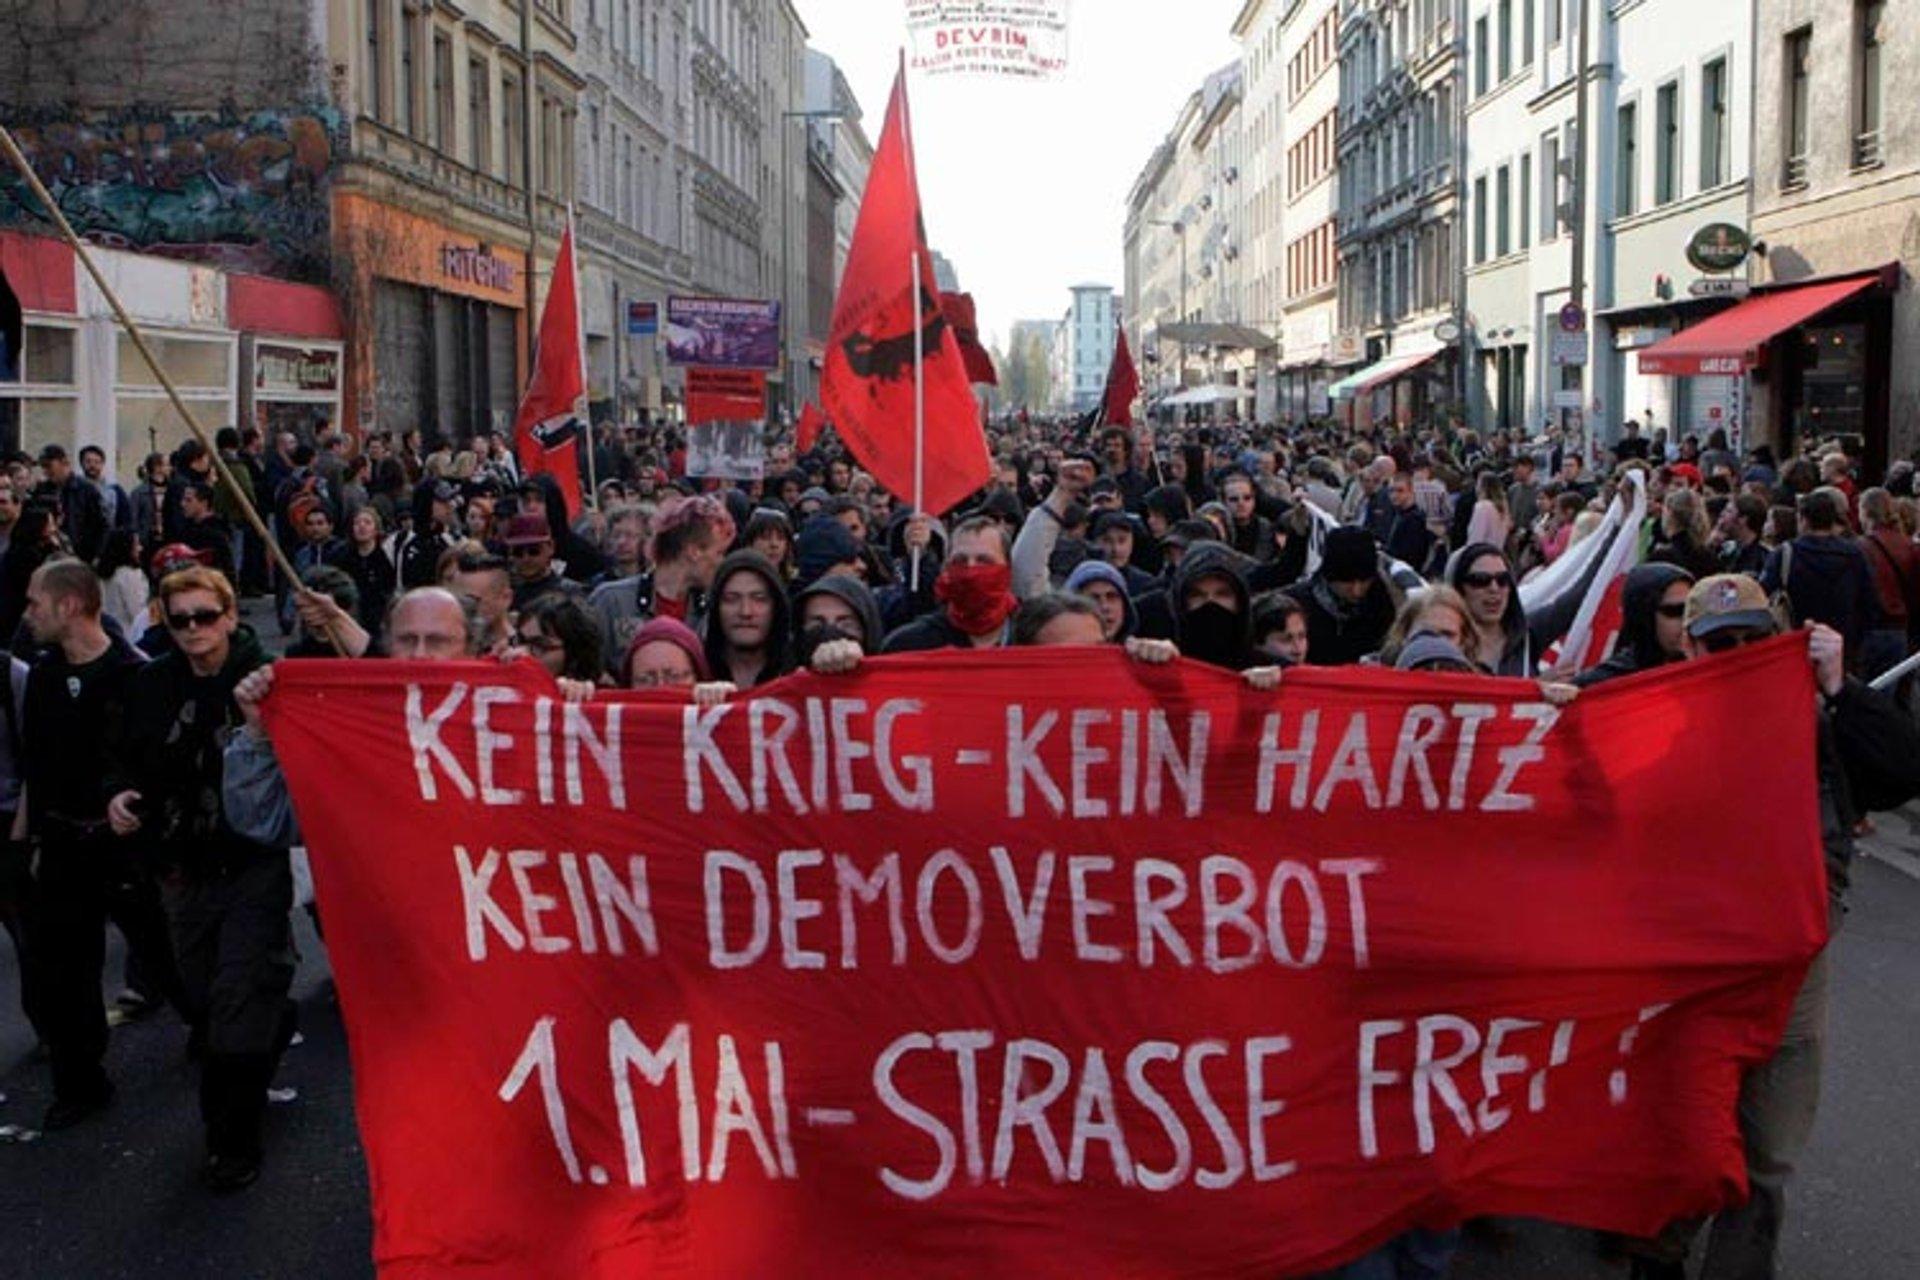 Revolutionary May 1 Demonstration 2006 Oranienstraße in Berlin-Kreuzberg, undeclared spontaneous demonstration 2020